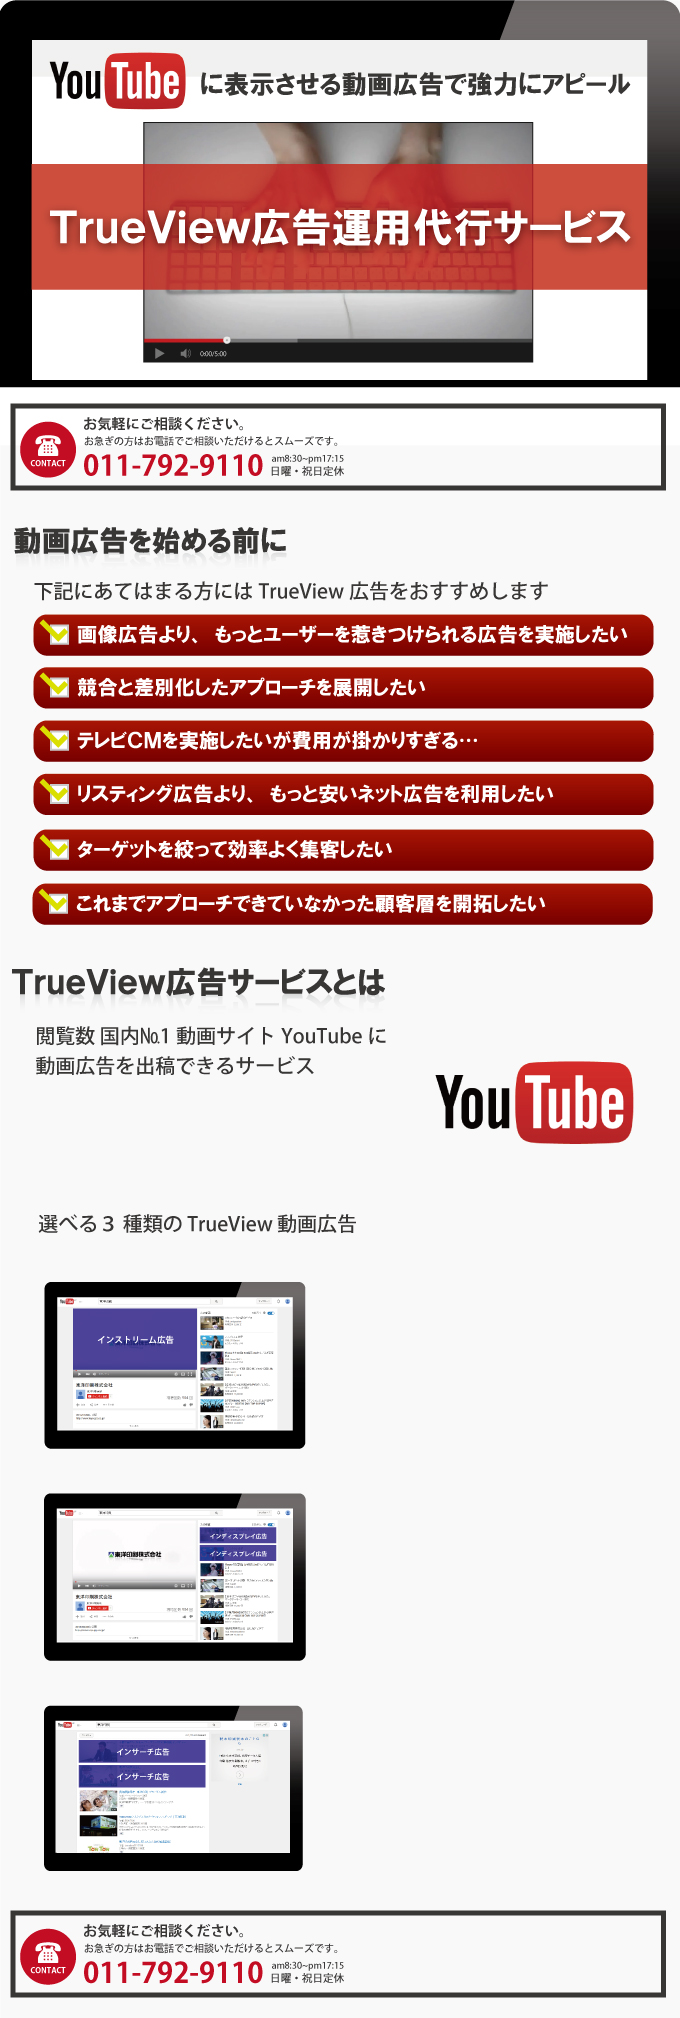 TrueView広告運用代行サービス